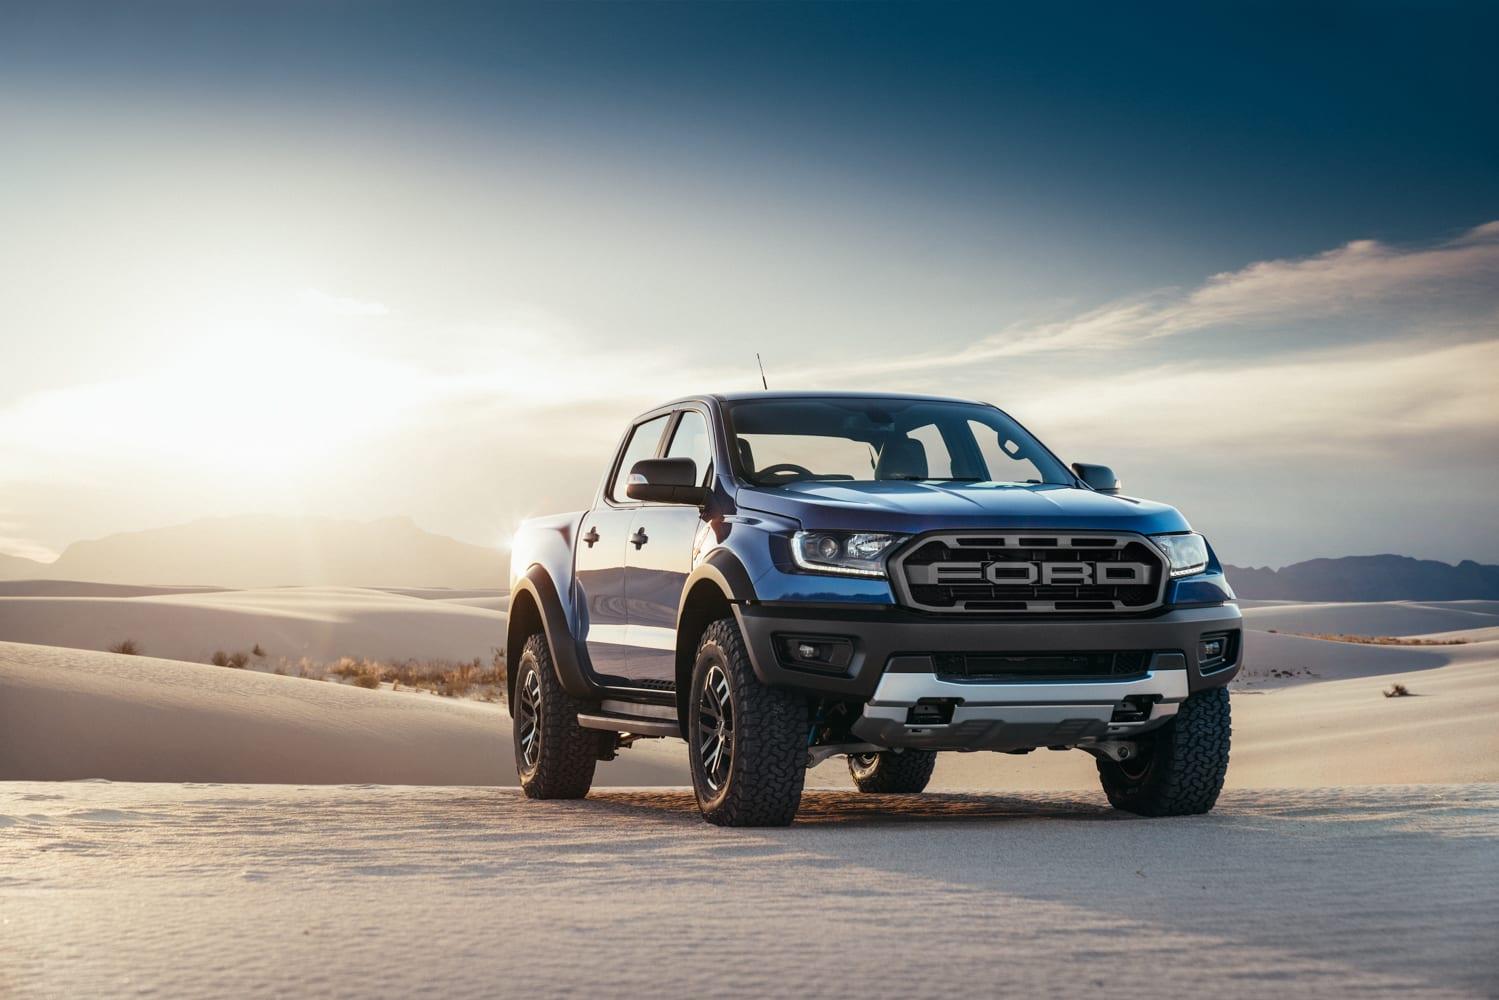 2018 Ford Ranger Raptor Ranger Raptor Outdoor 3 web